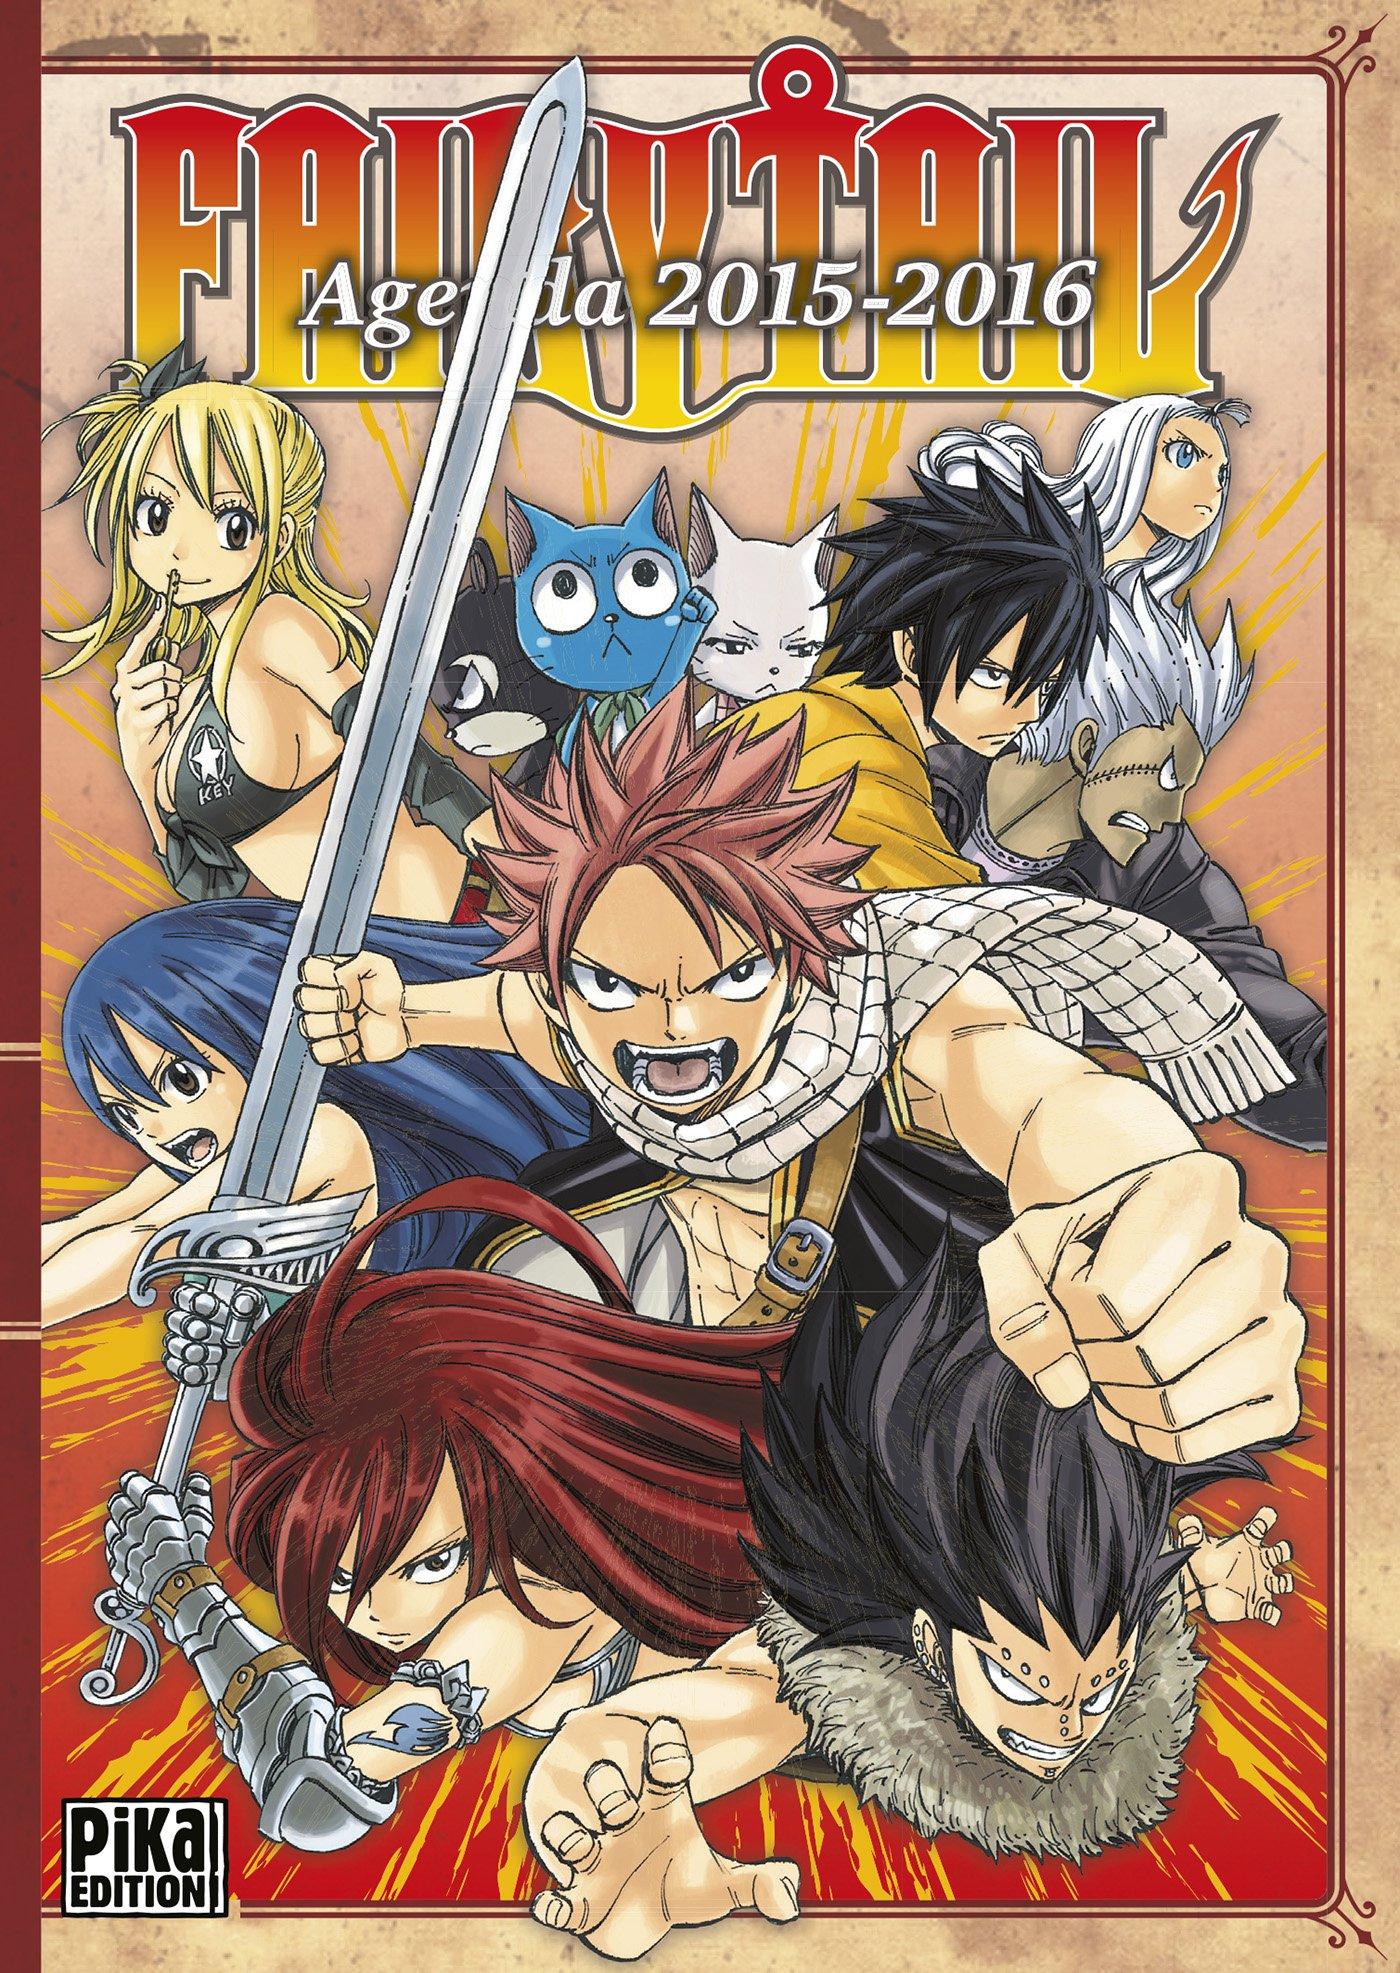 Agenda Fairy Tail 2015-2016: 9782811619350: Amazon.com: Books